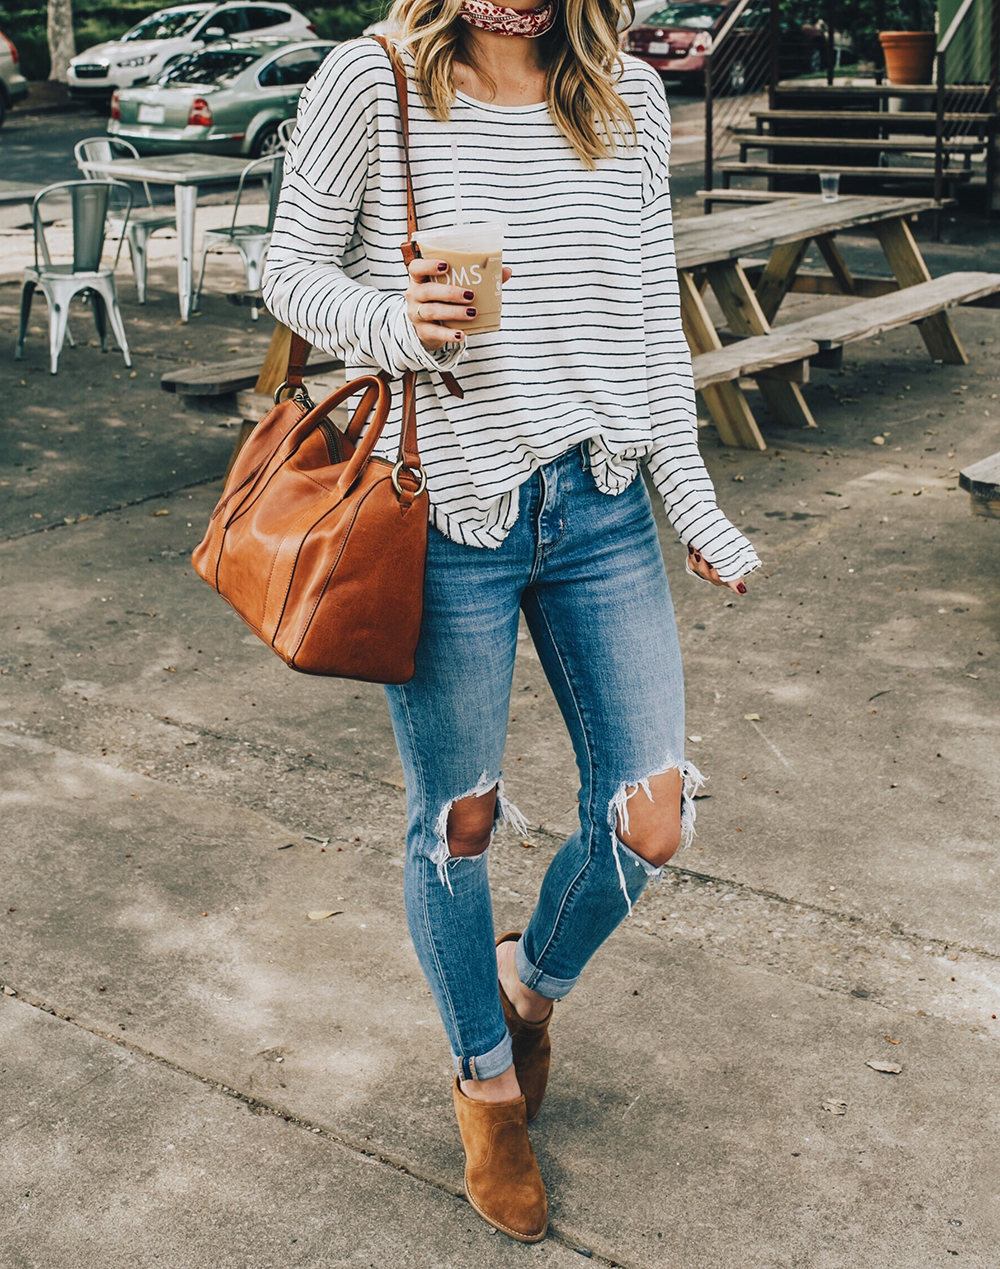 livvyland-blog-olivia-watson-best-cyber-monday-sales-levis-501-jeans